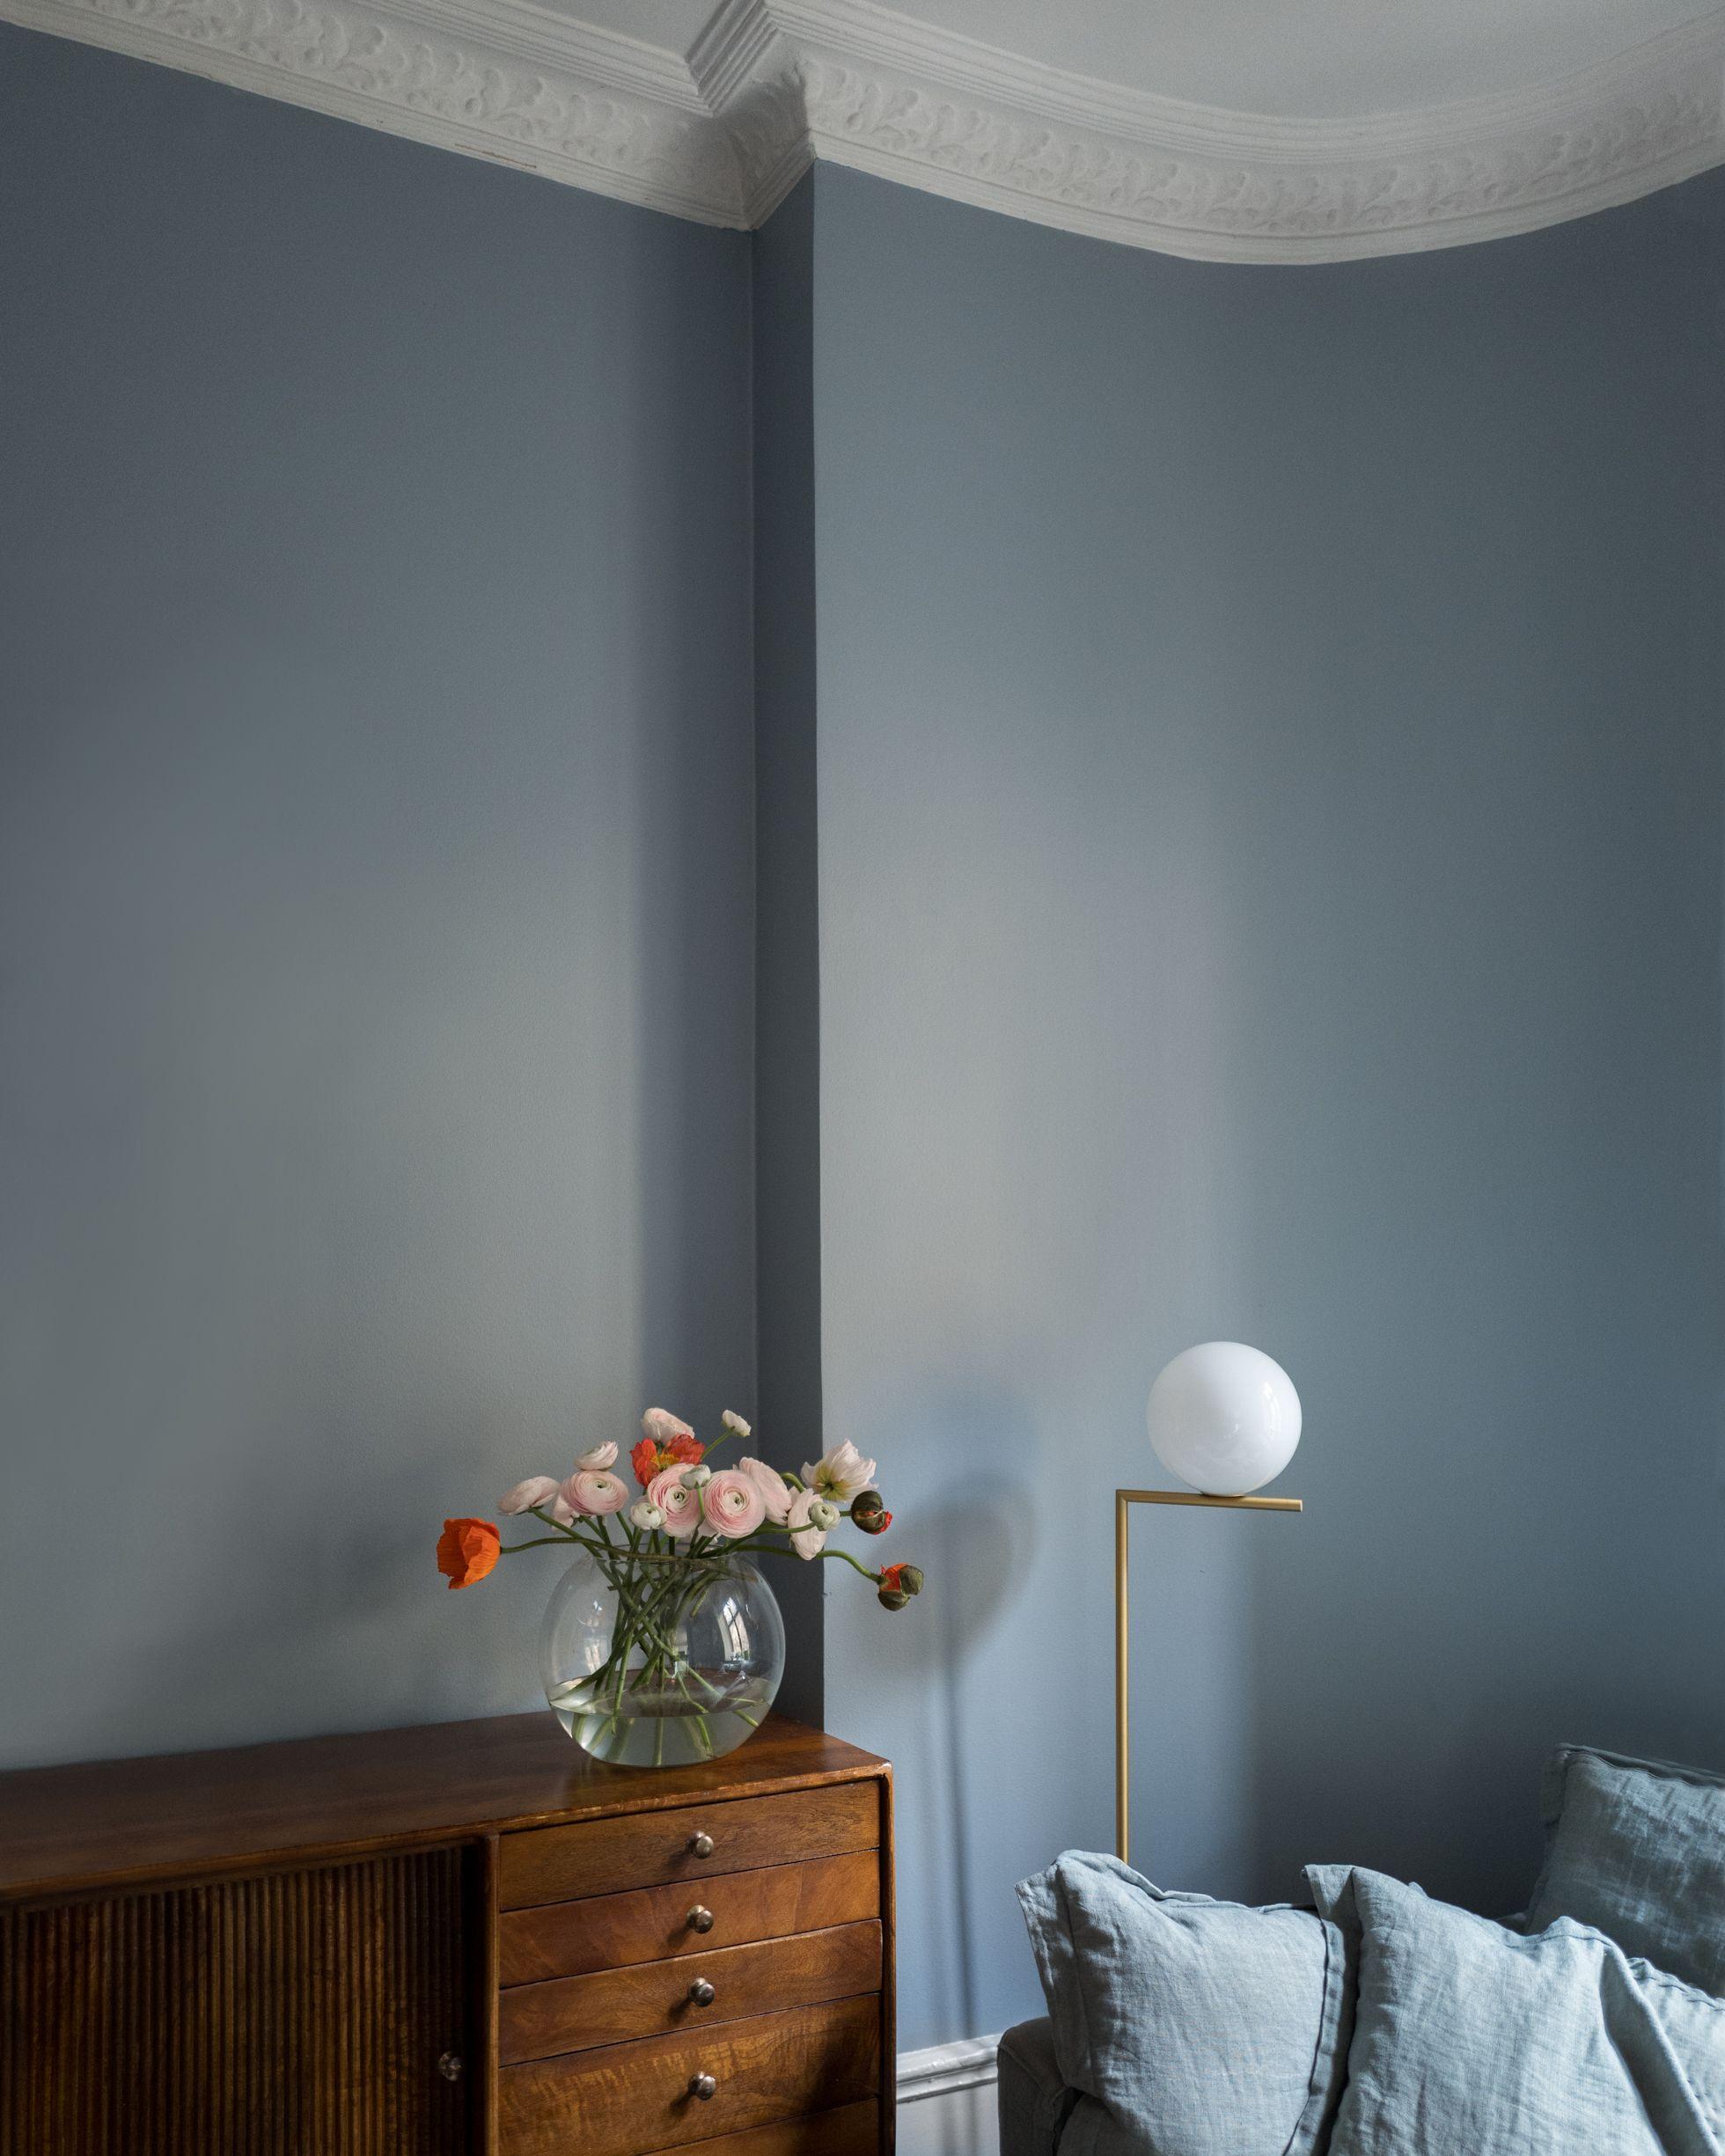 lisa olsson apartment home Home 1 Pinterest